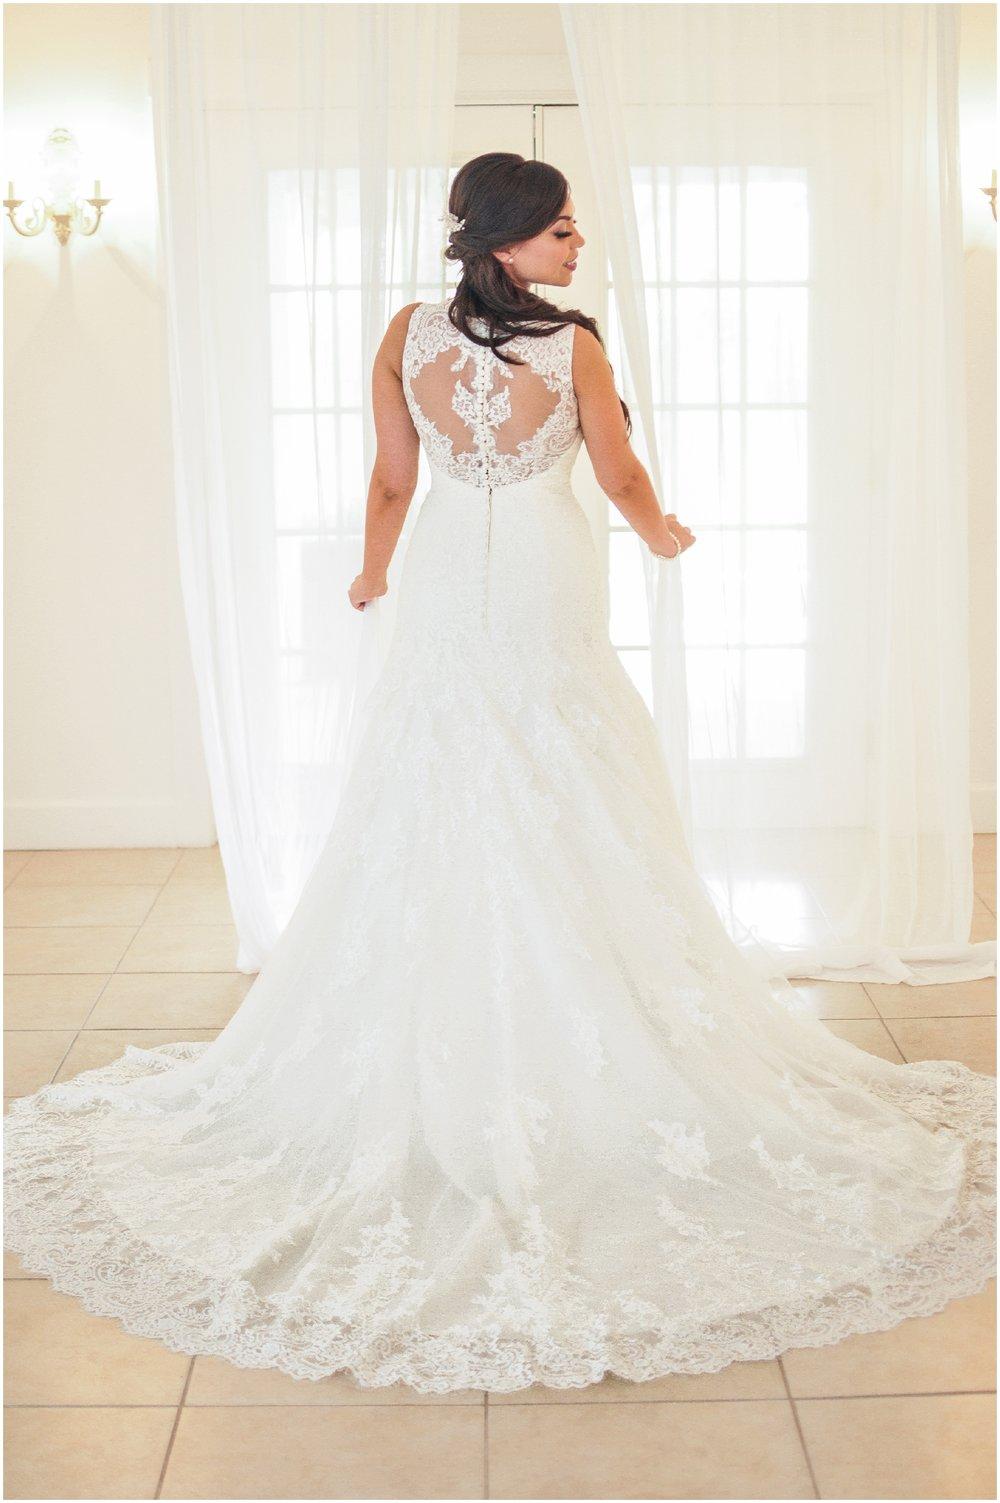 Rustic-Elegant-Wedding-Venue-in-Tampa-Stonebridge-Events_0418.jpg